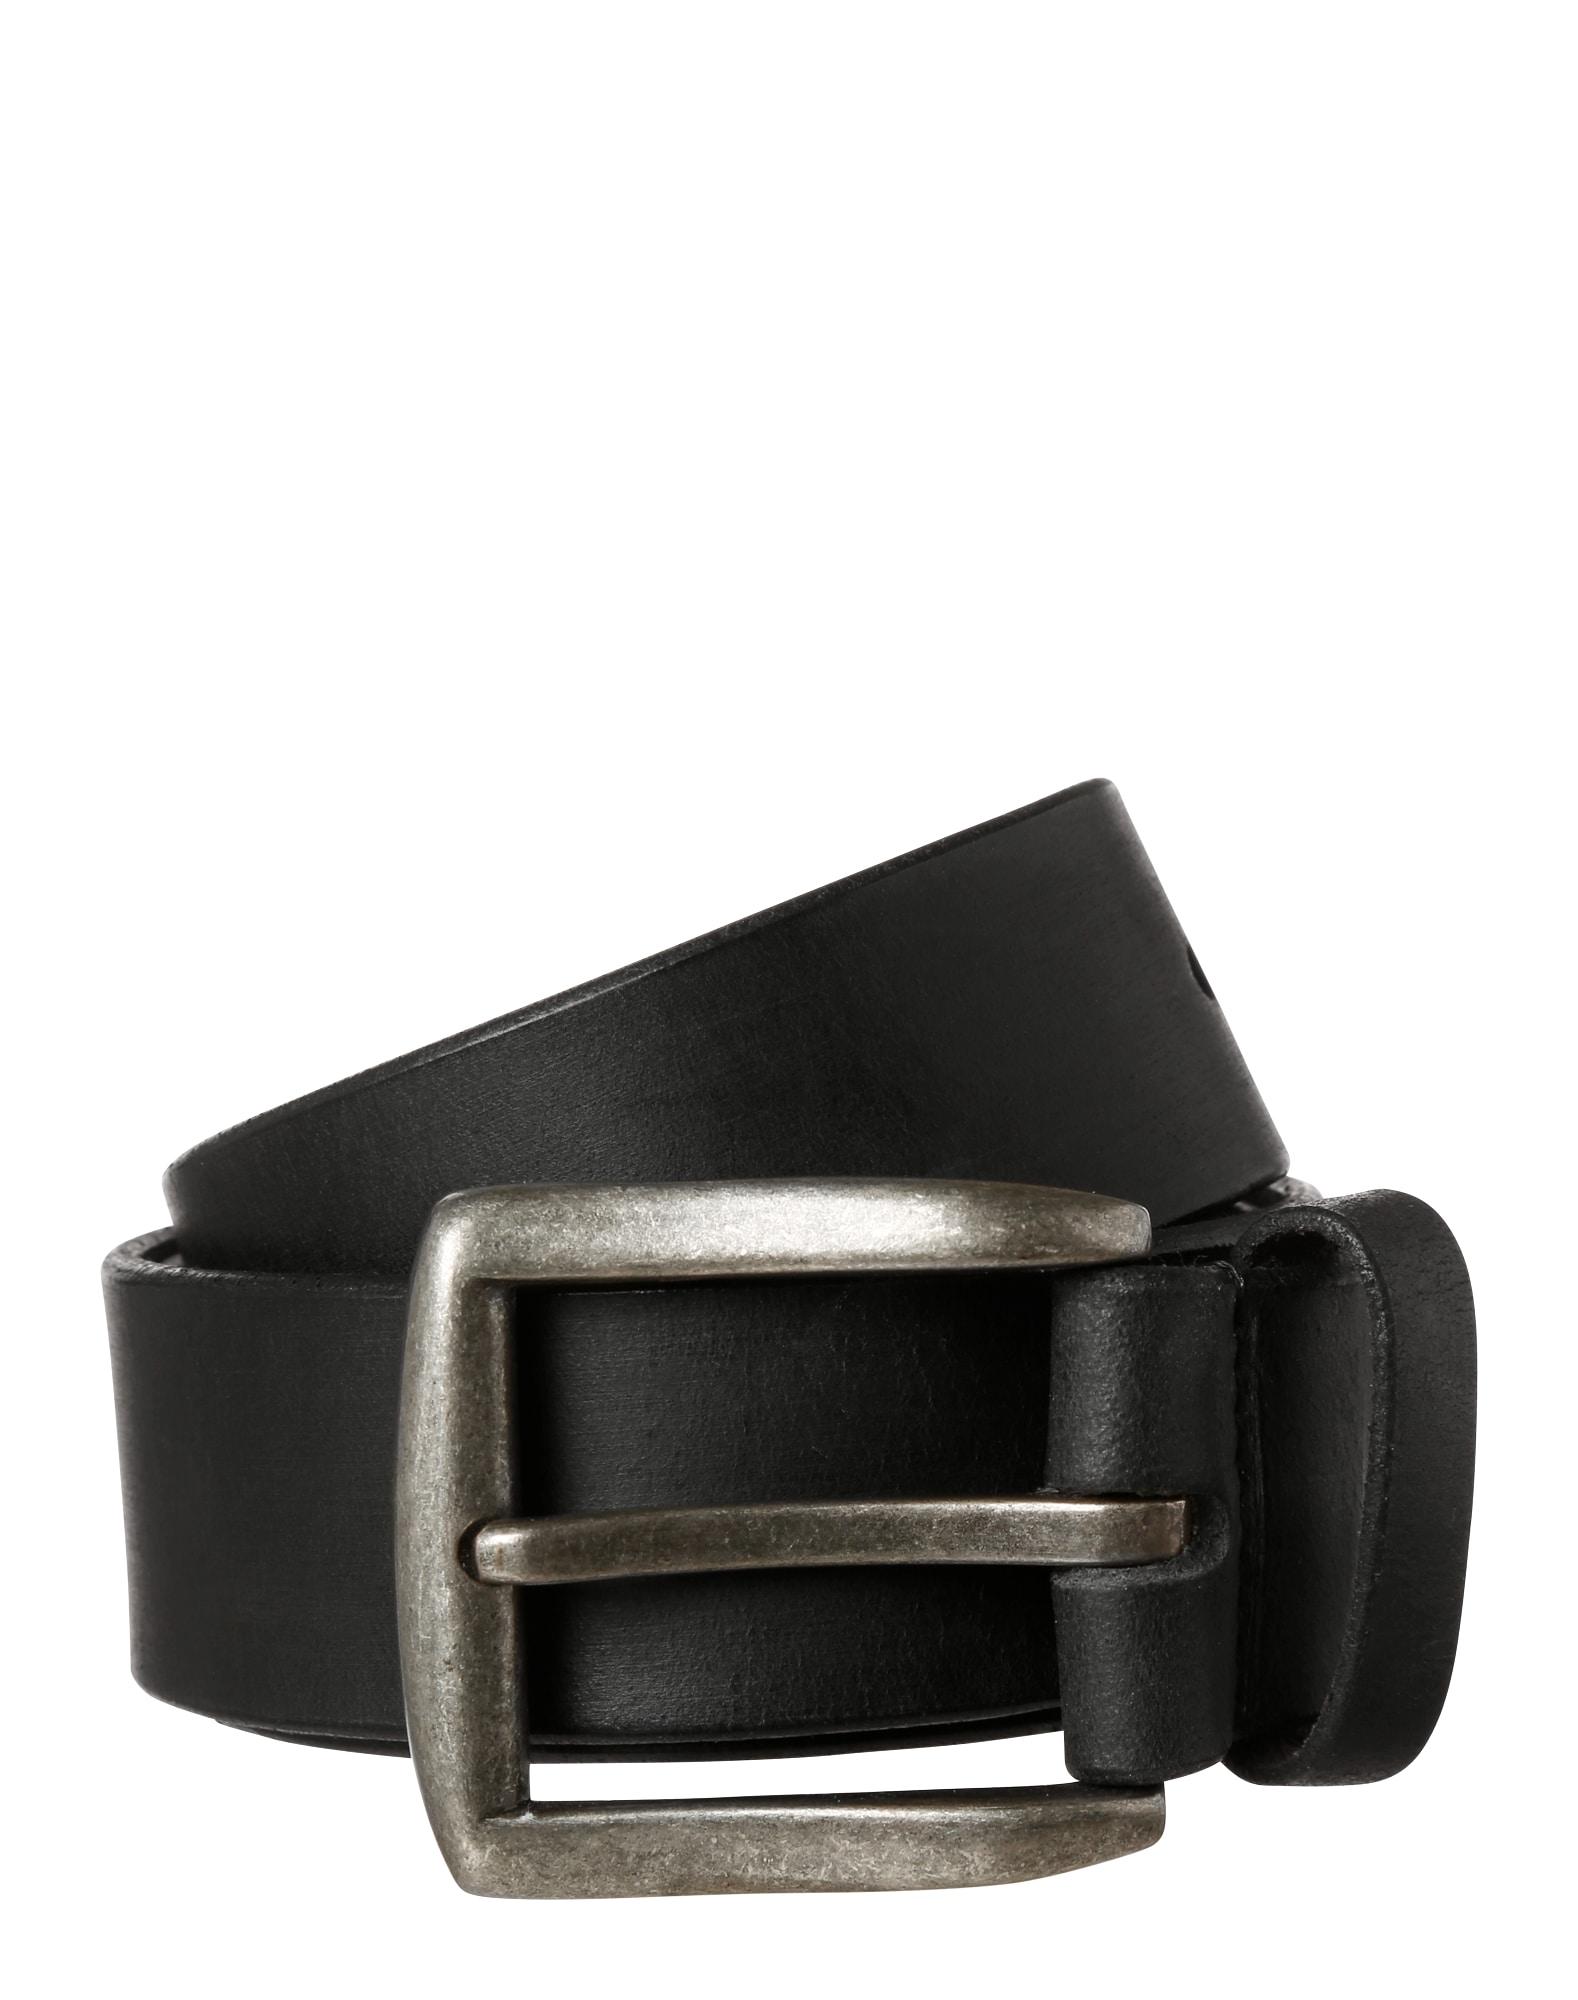 Leder-Gürtel | Accessoires > Gürtel > Ledergürtel | Schwarz | PIECES